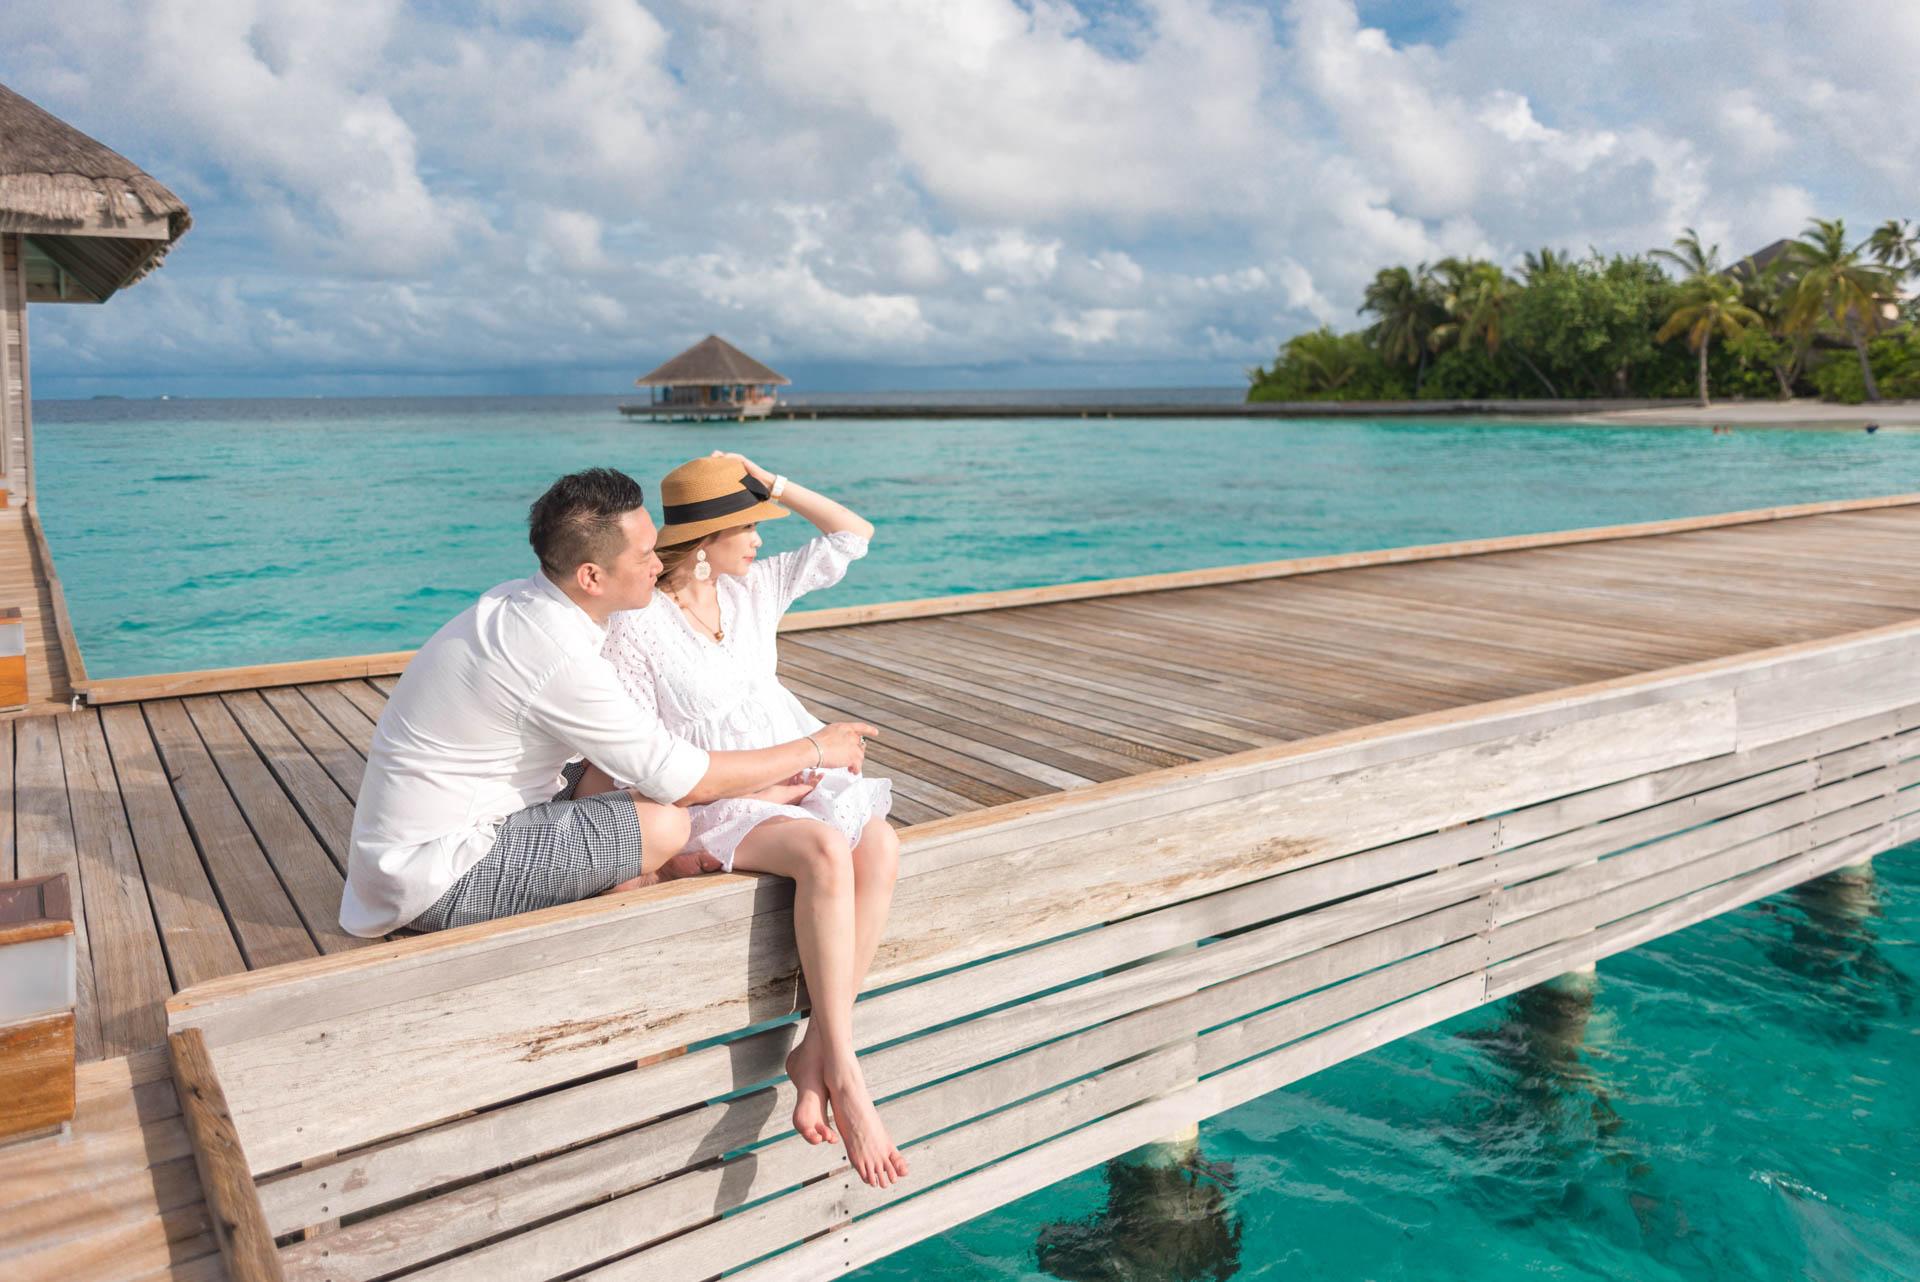 Chin Siew and Chin Yee Honeymoon in Maldives at Huvafen Fushi Resort Under Water Spa 21